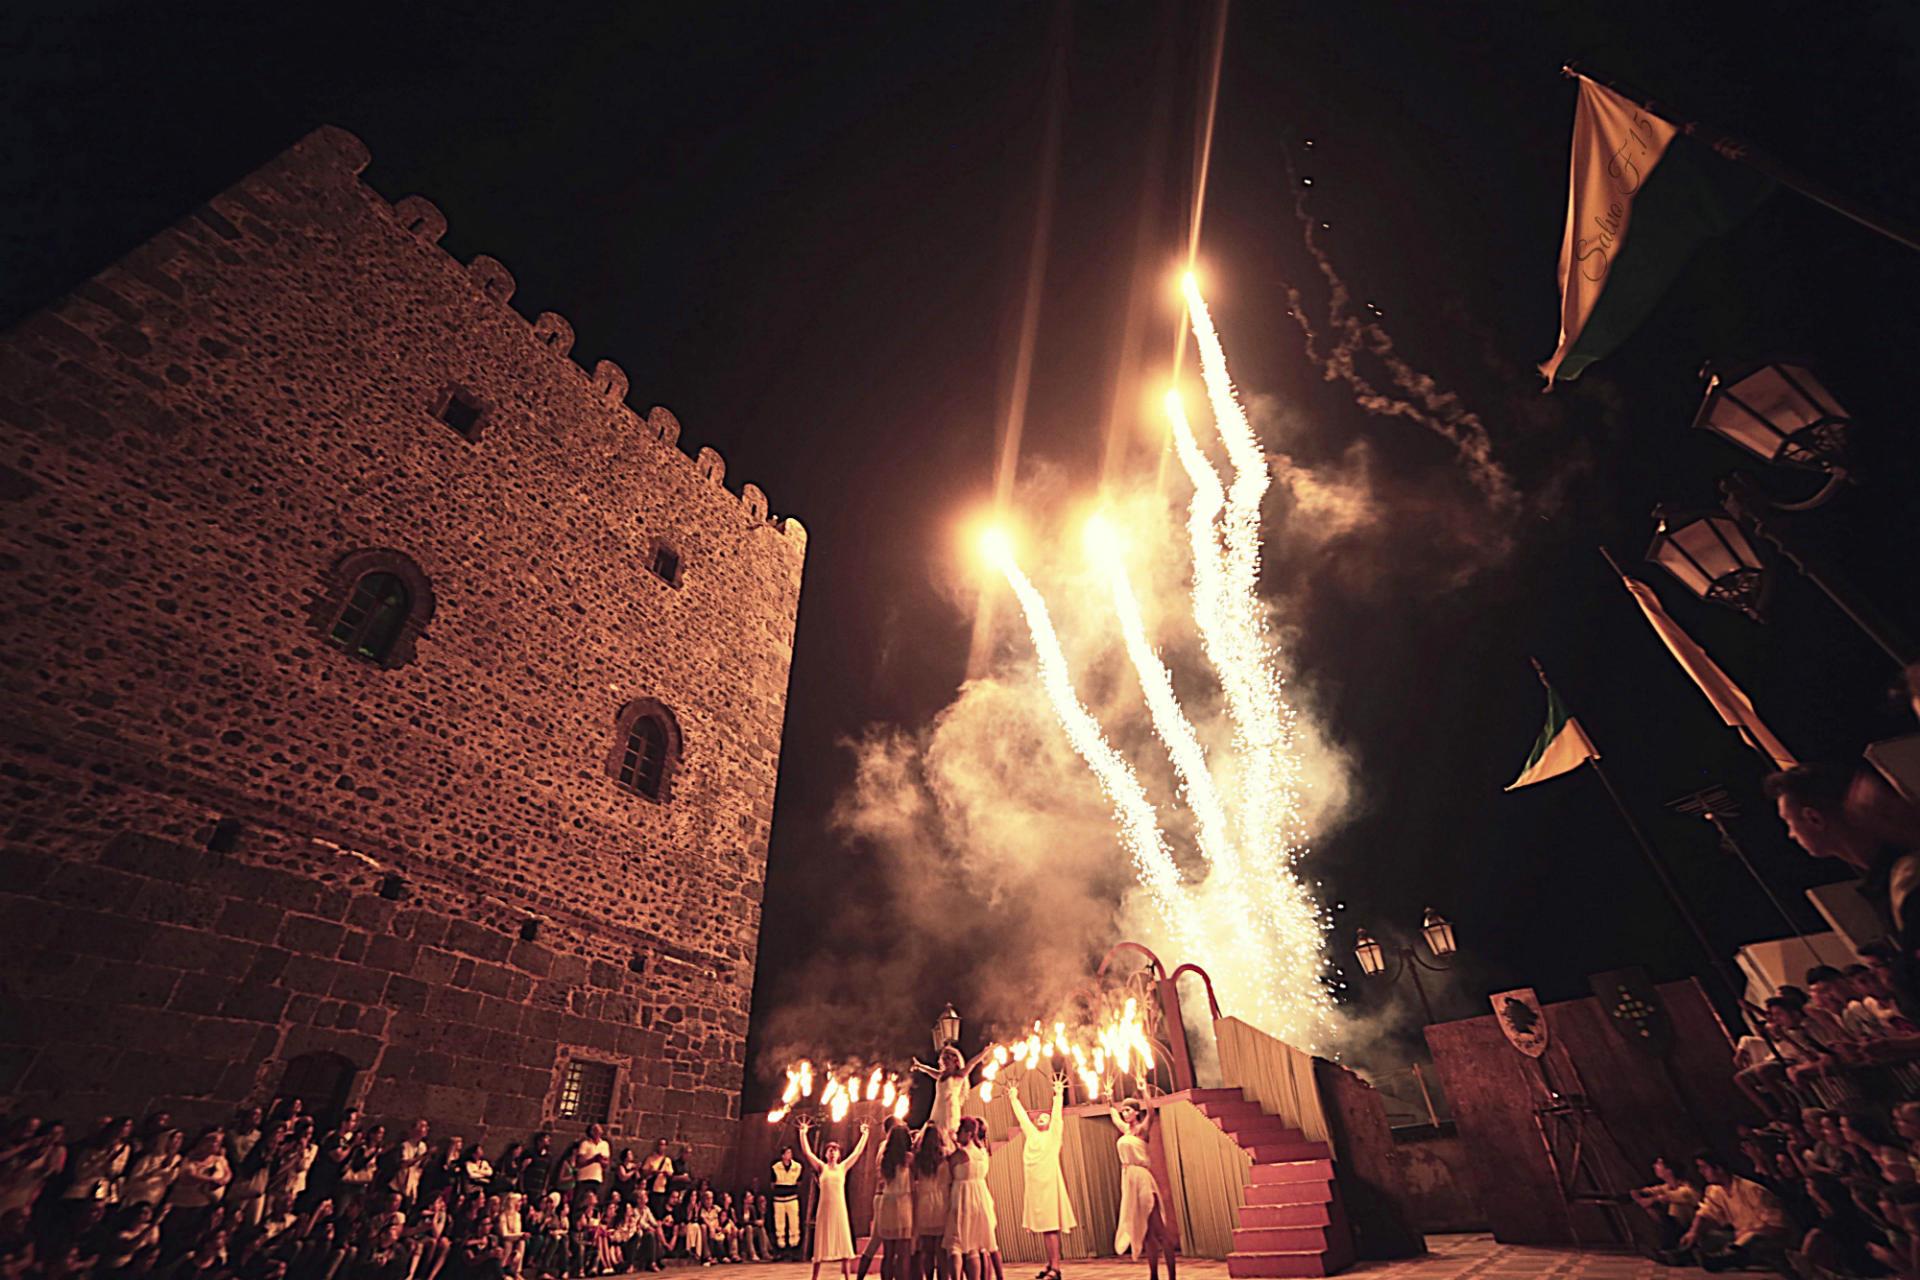 Motta SantAnastasia, festa medievale, associazione casa normanna, eventrip